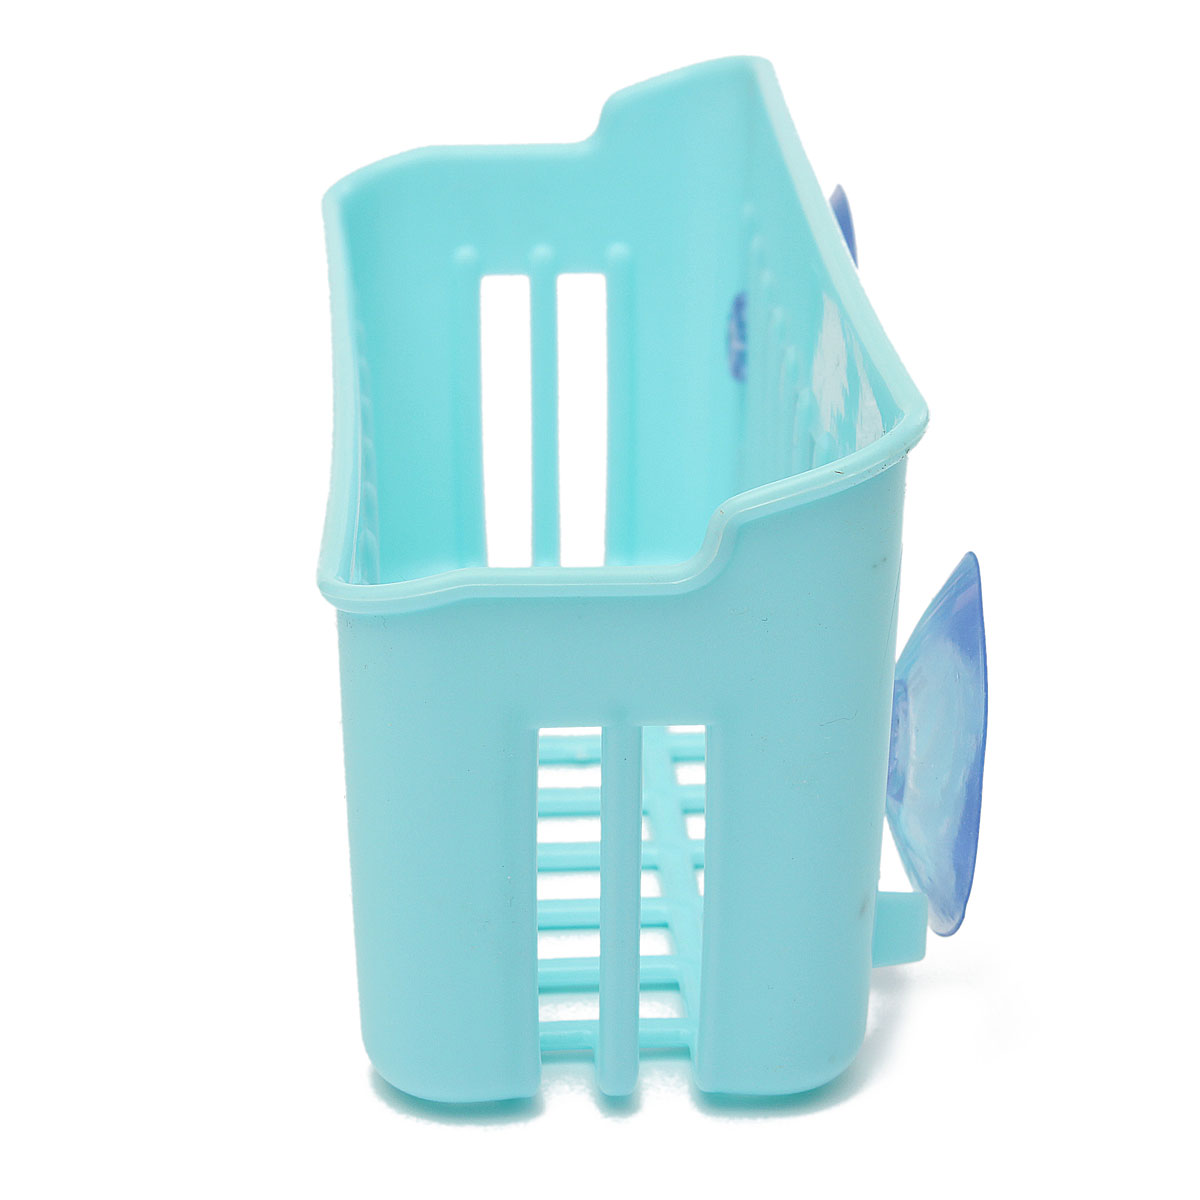 Duschablage Saugnapf : Cutlery Drying Basket